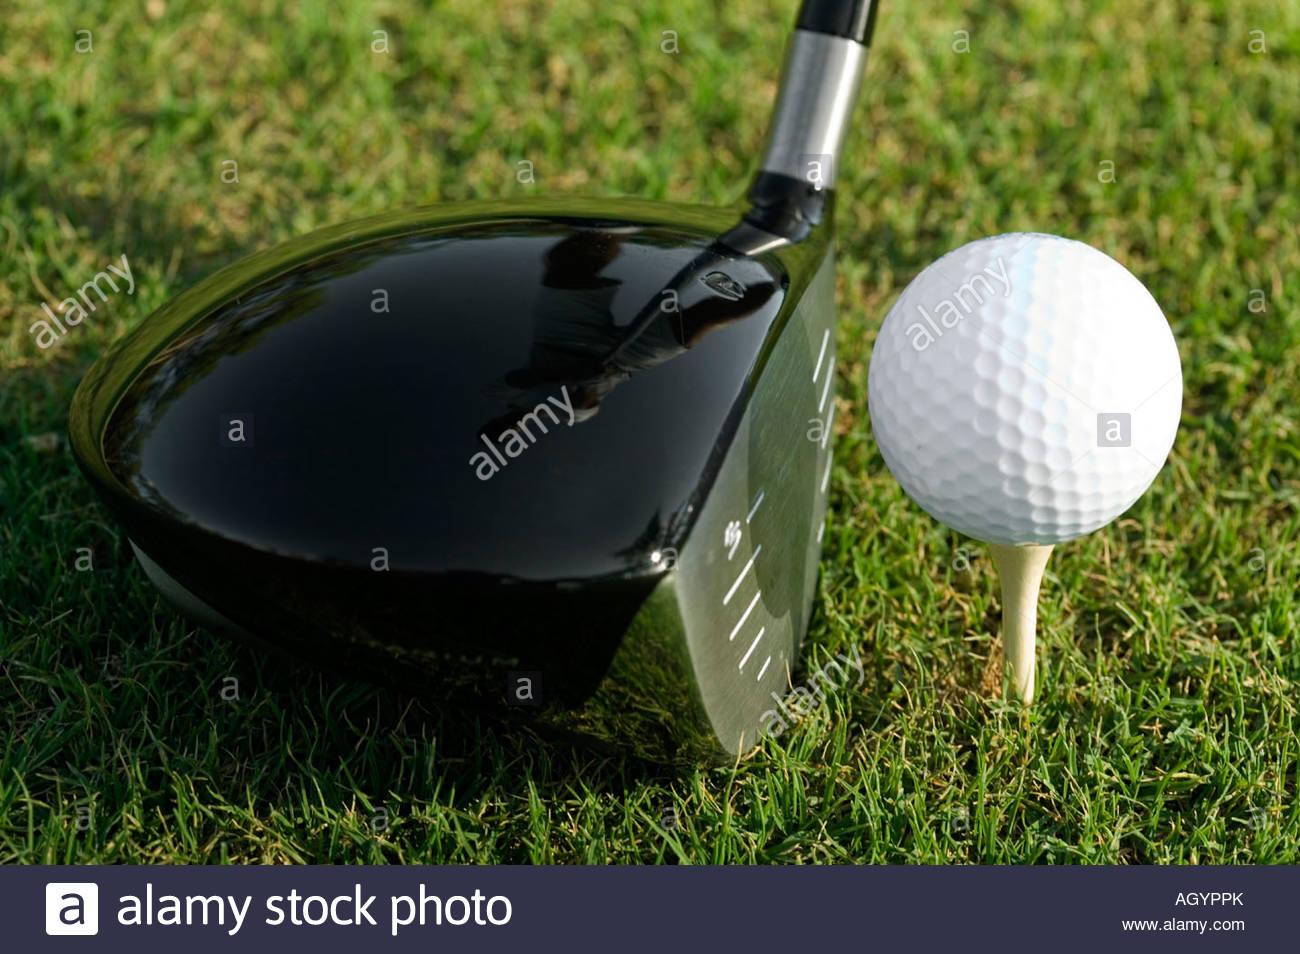 Nahaufnahme von Golf Club neben Golfball Stockbild